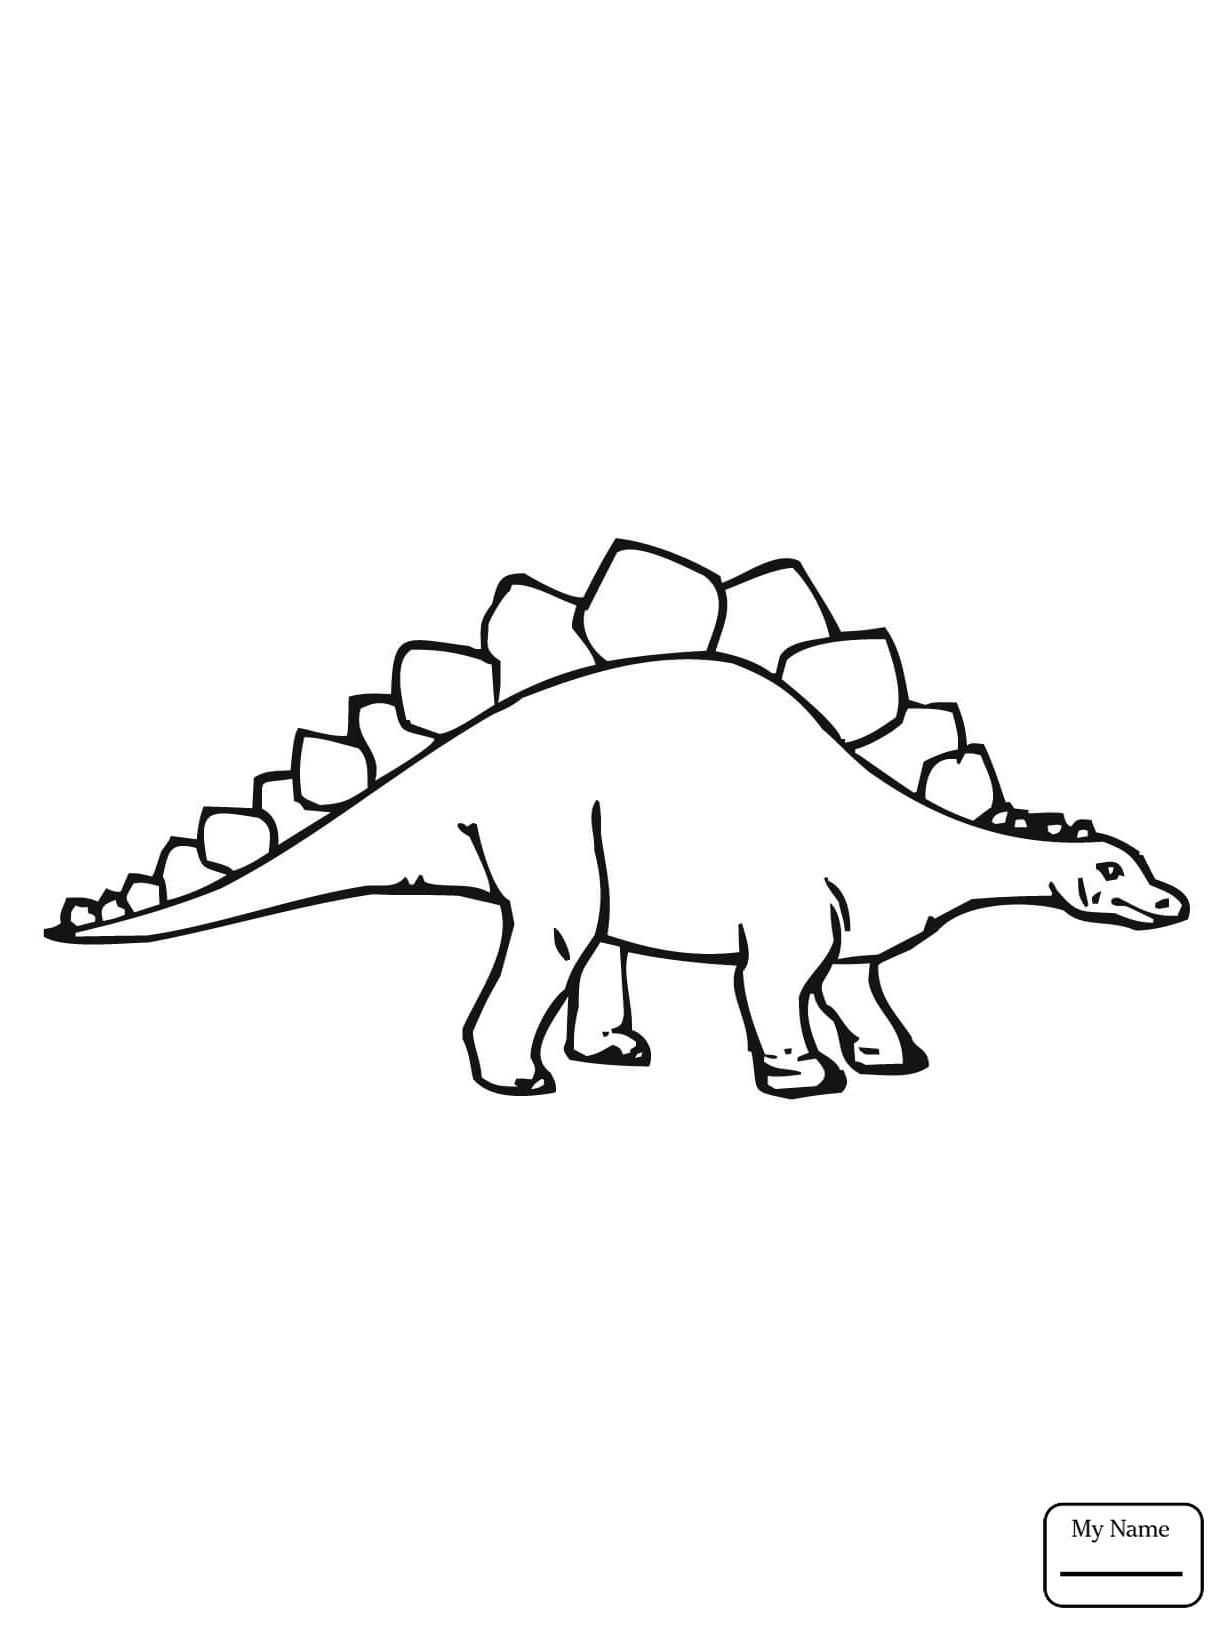 1224x1632 Coloring Pages Stegosaurus Dinosaurs Stegosaurus Dino